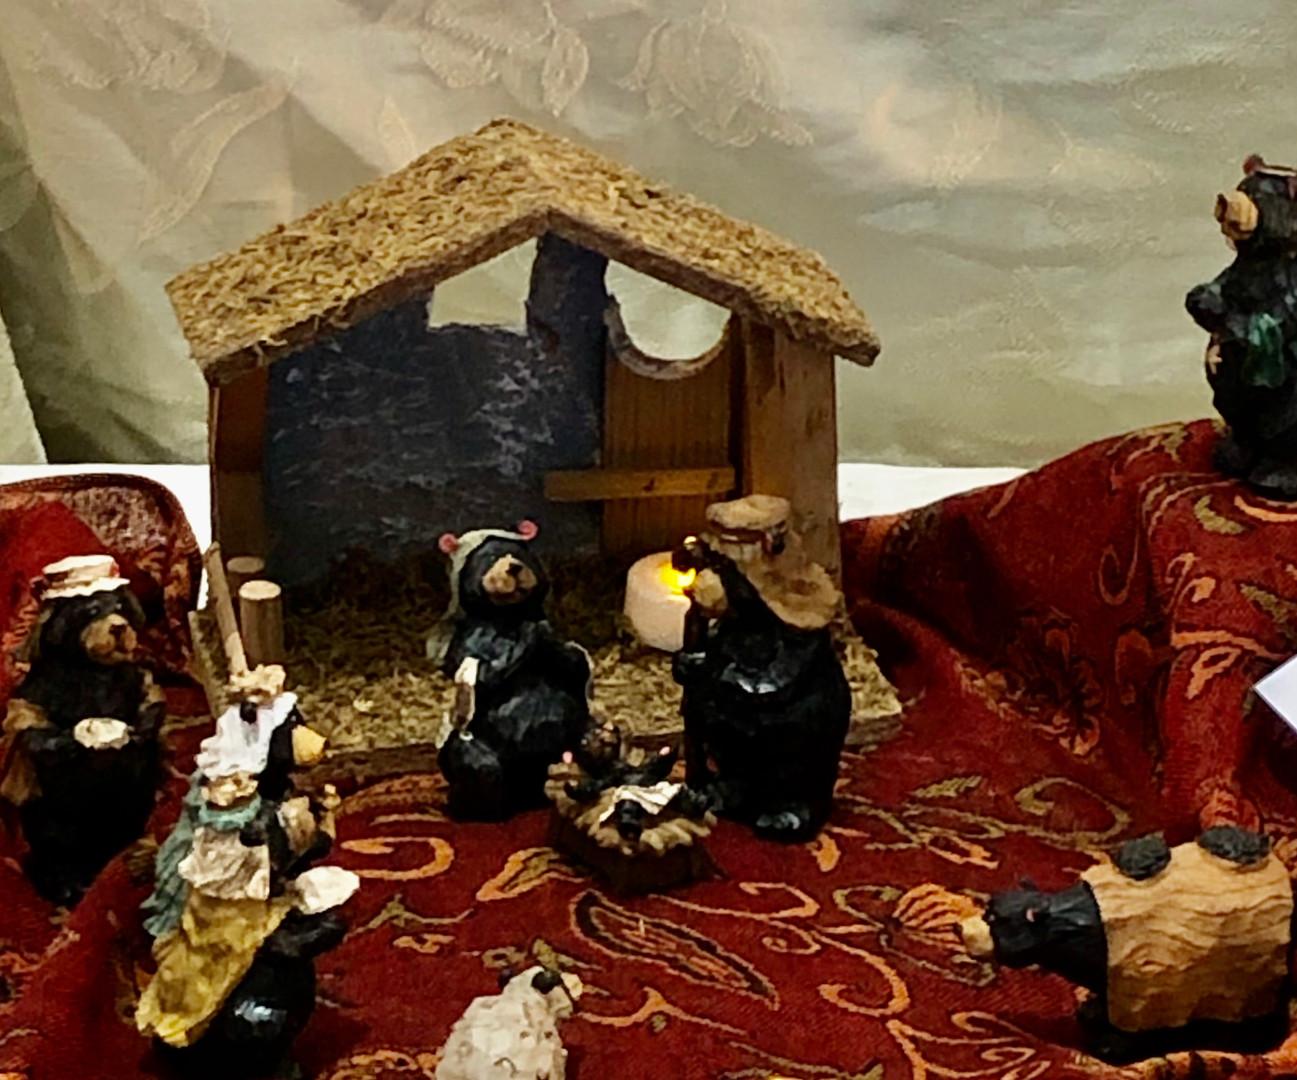 Linda Weifenbach: Black Bear Nativity